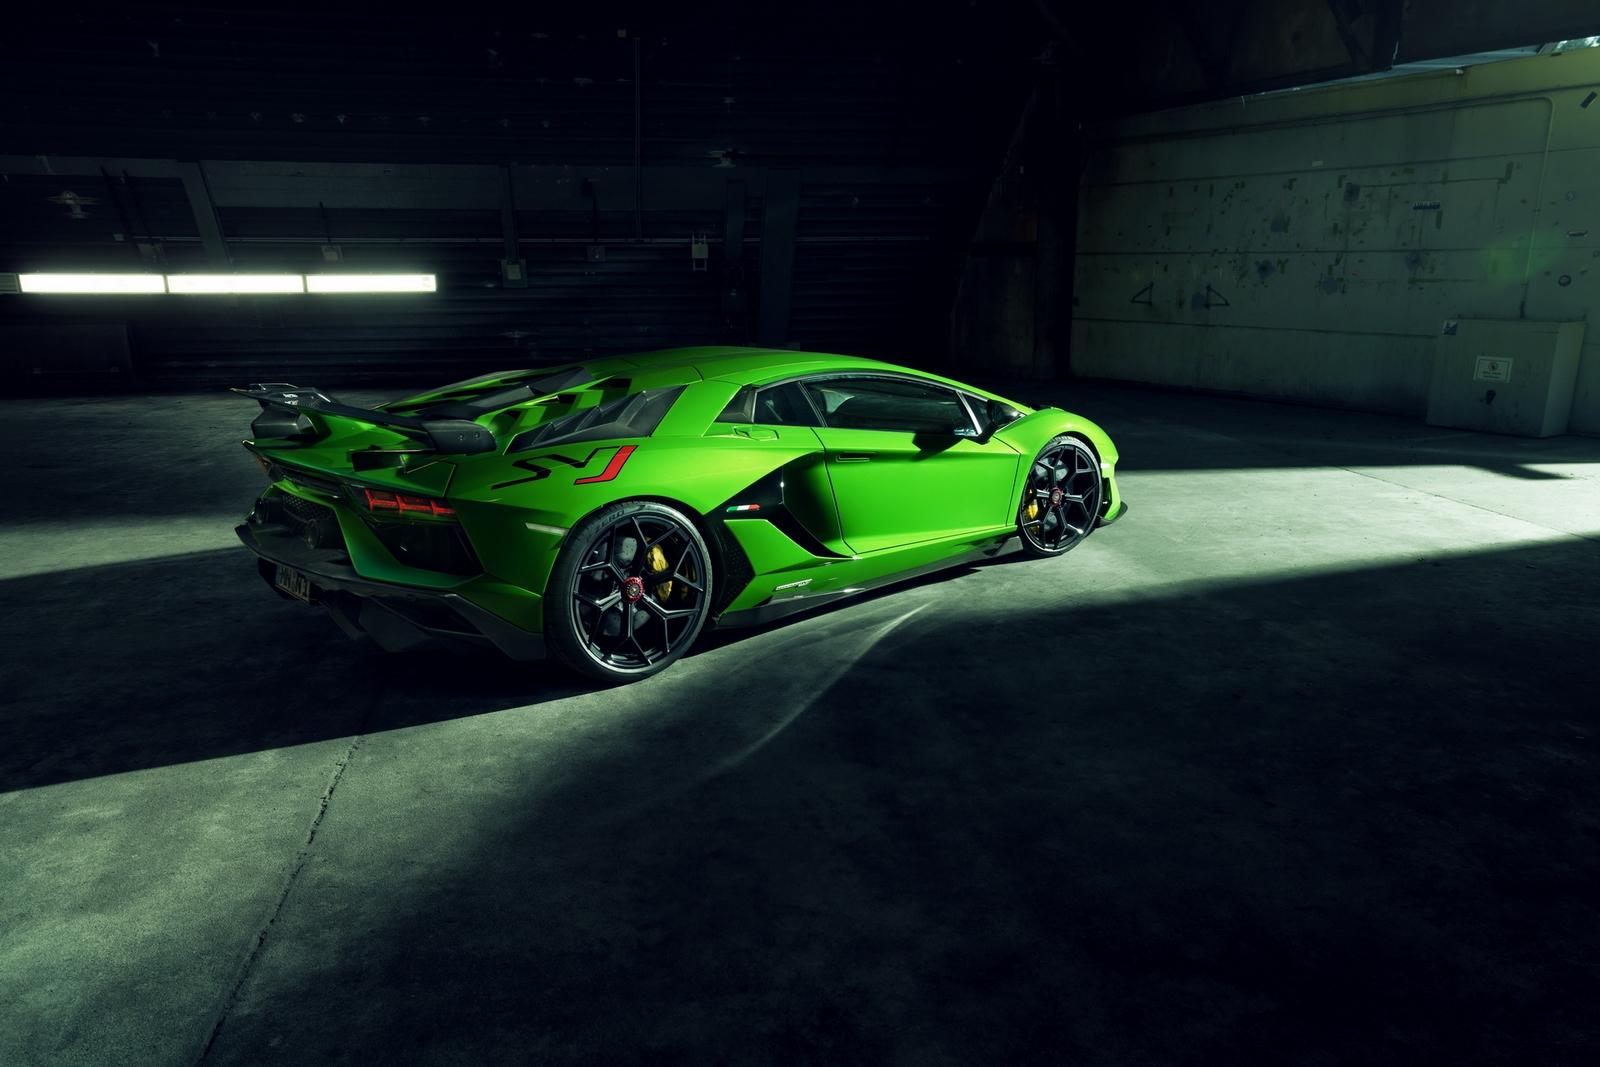 Lamborghini Aventador SVJ Novitec